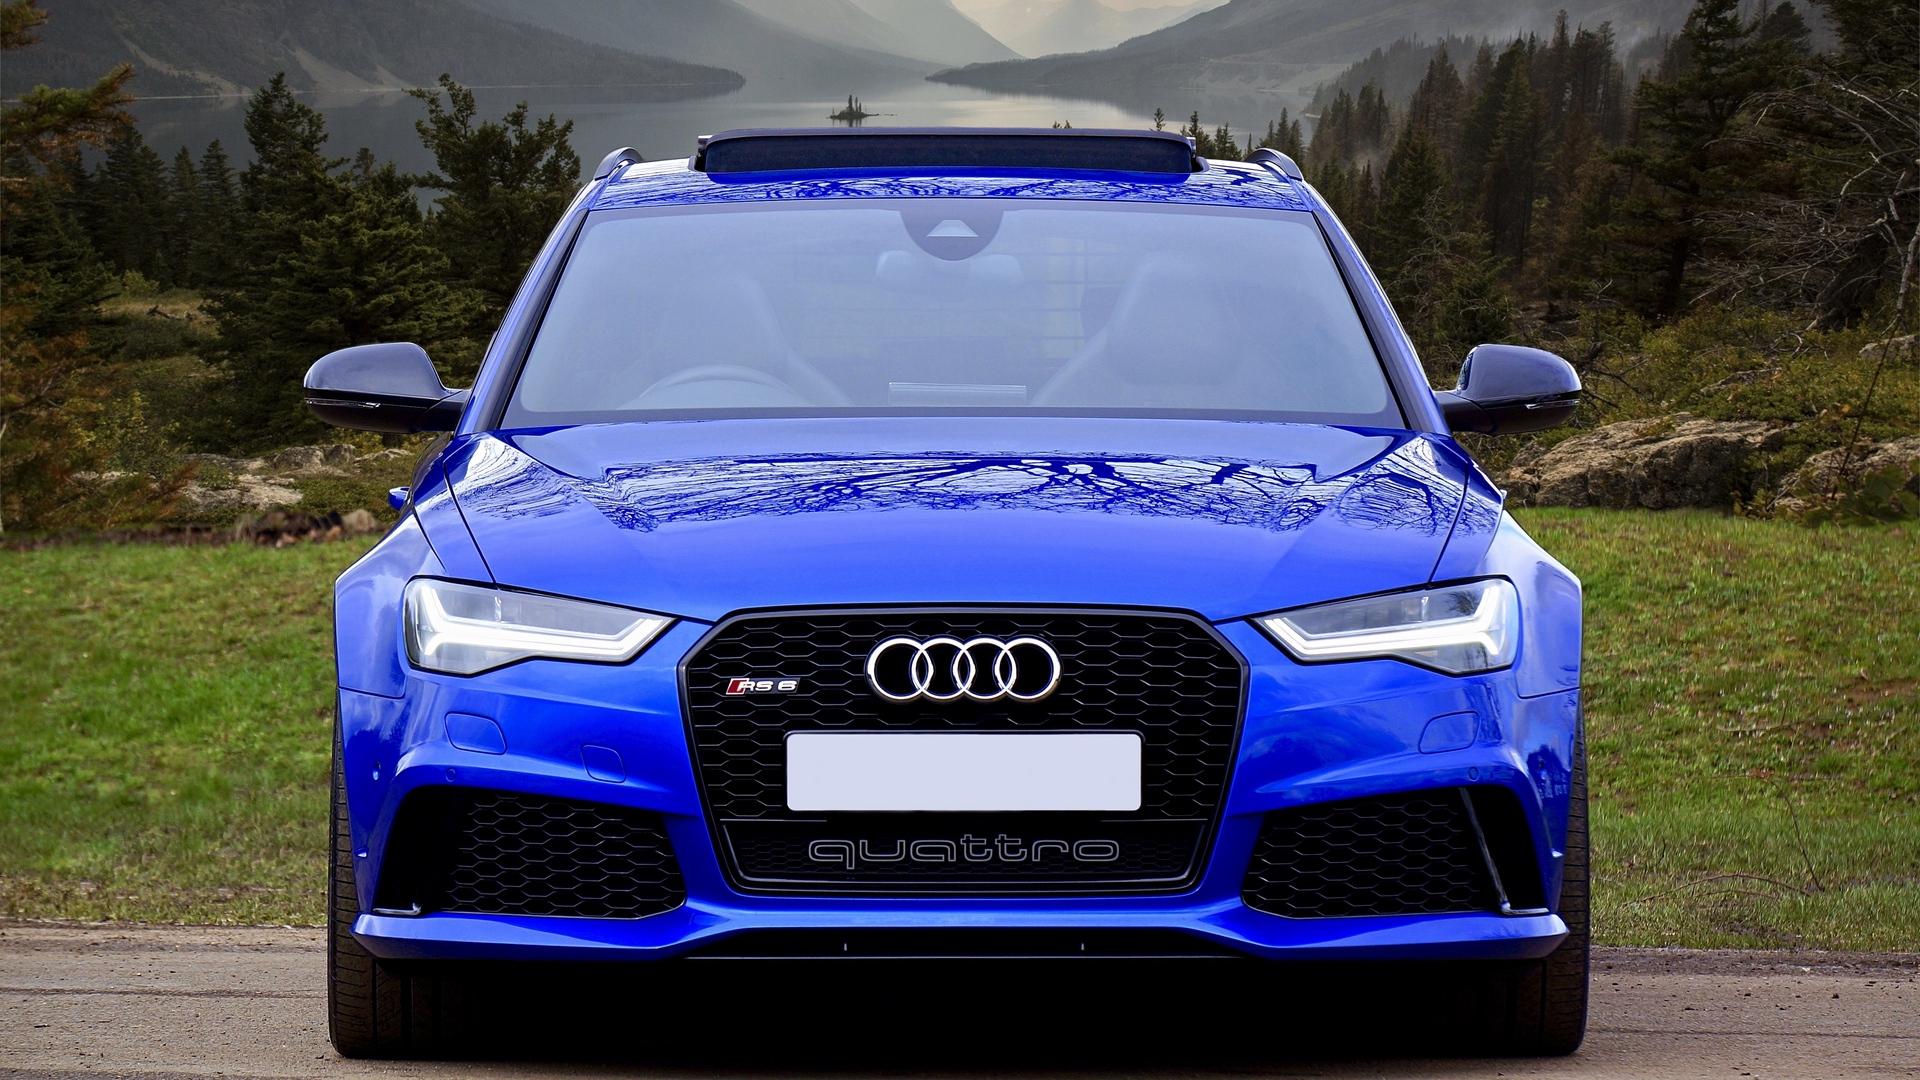 Wallpaper Audi Rs6 Audi Car Blue Front View 2175592